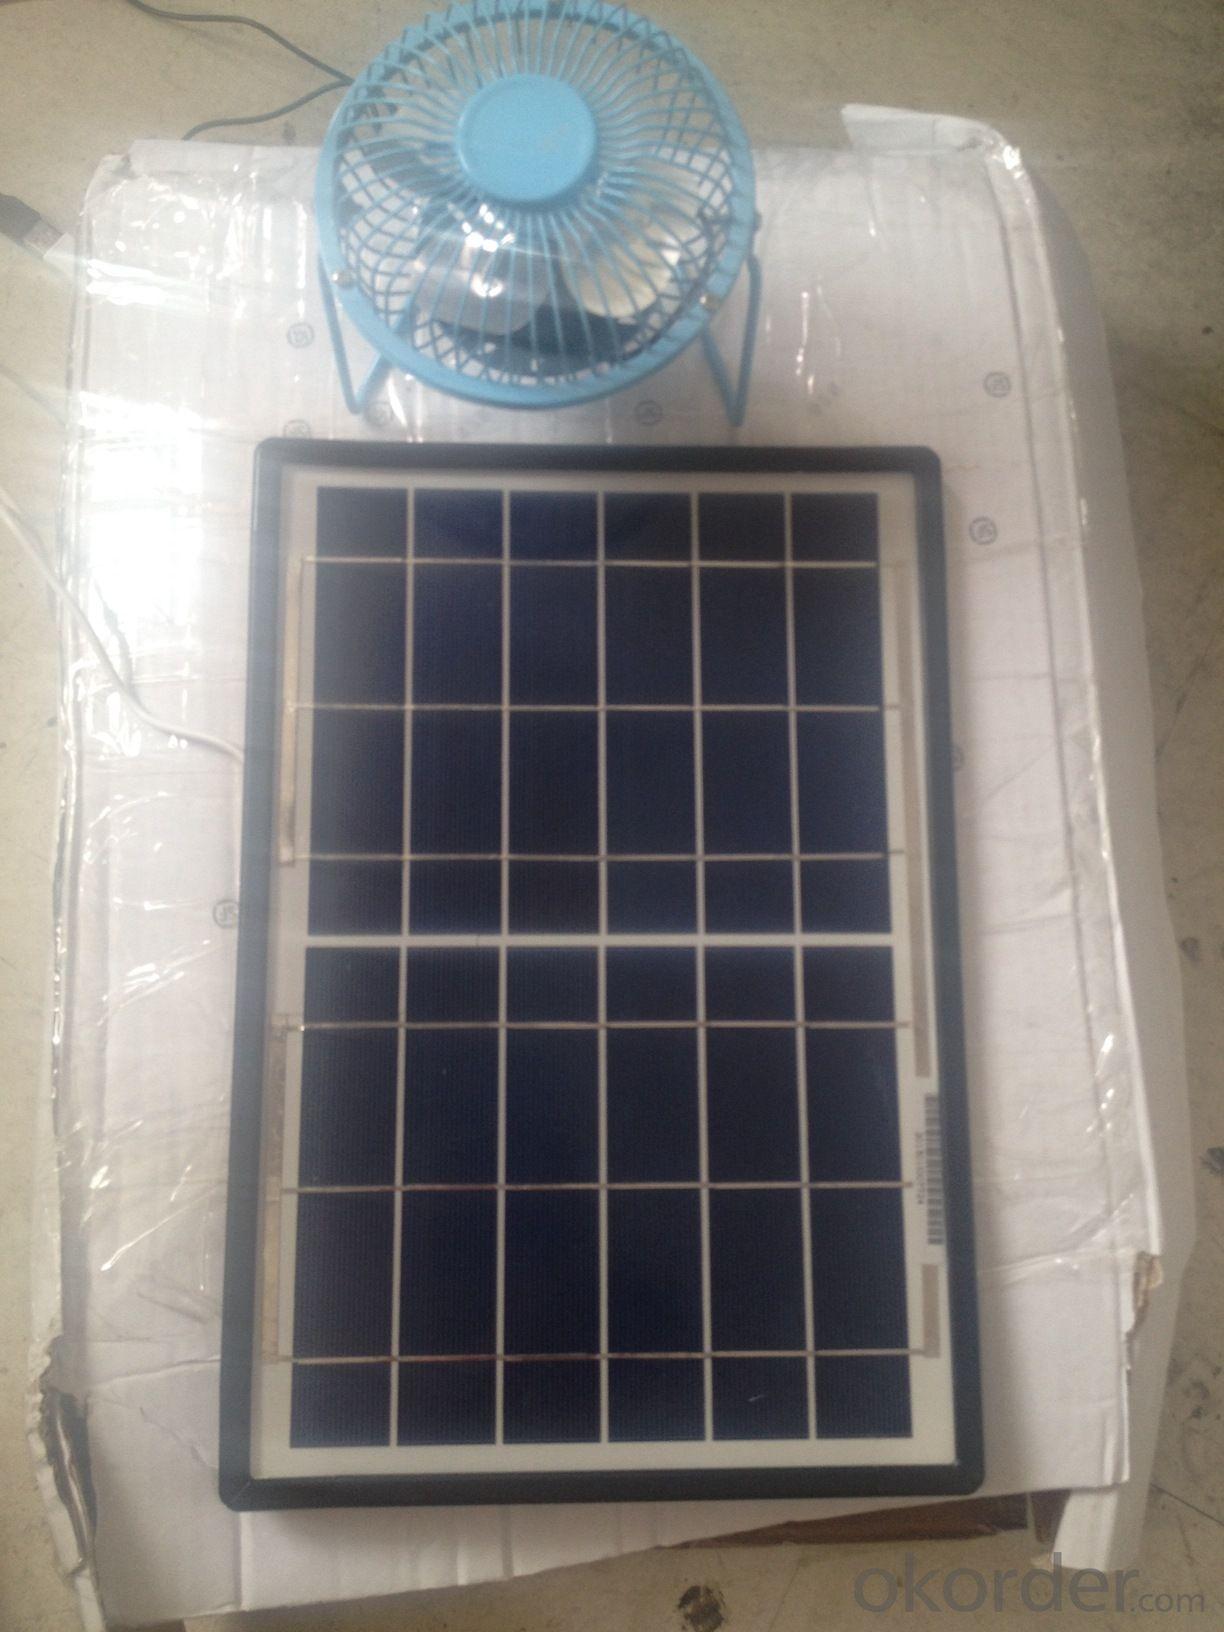 Monocrystalline Solar Panels-10W-Apply to solar systems